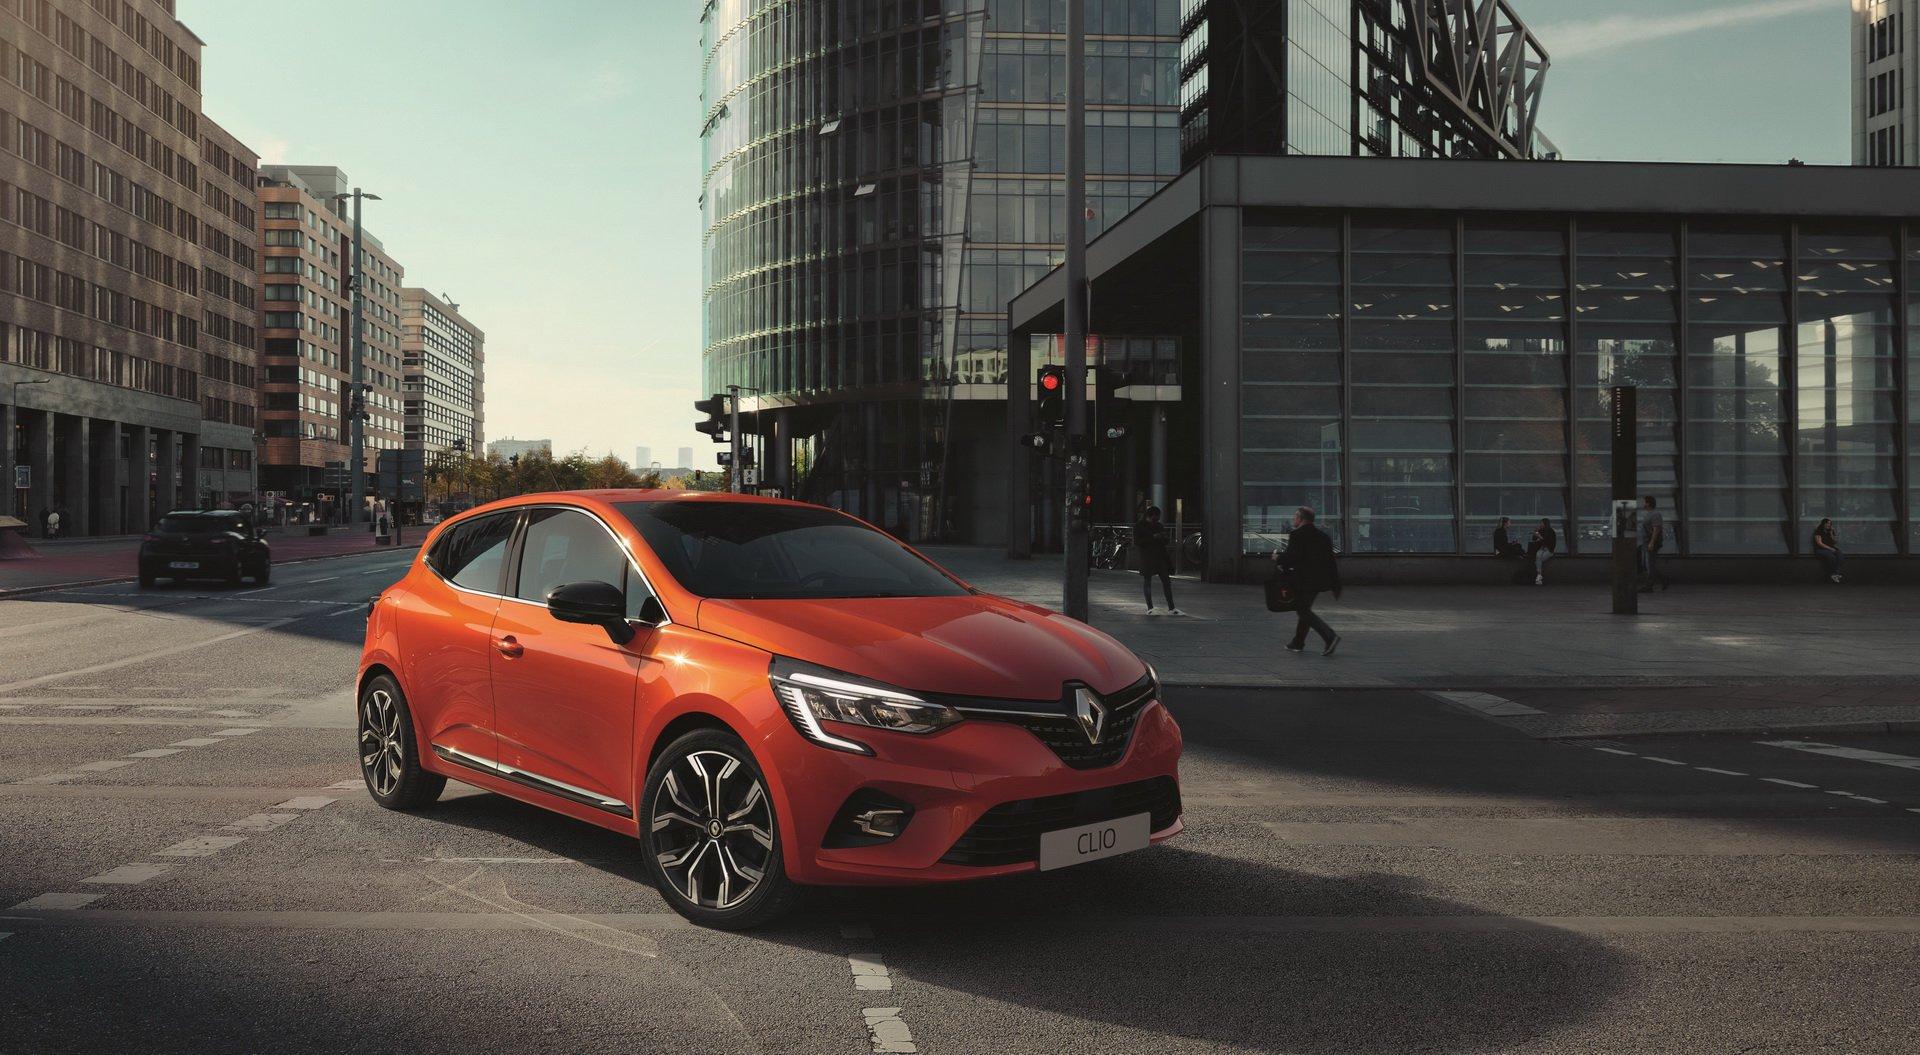 Noua generatie Renault Clio este aici: exterior mai modern si interior inteligent